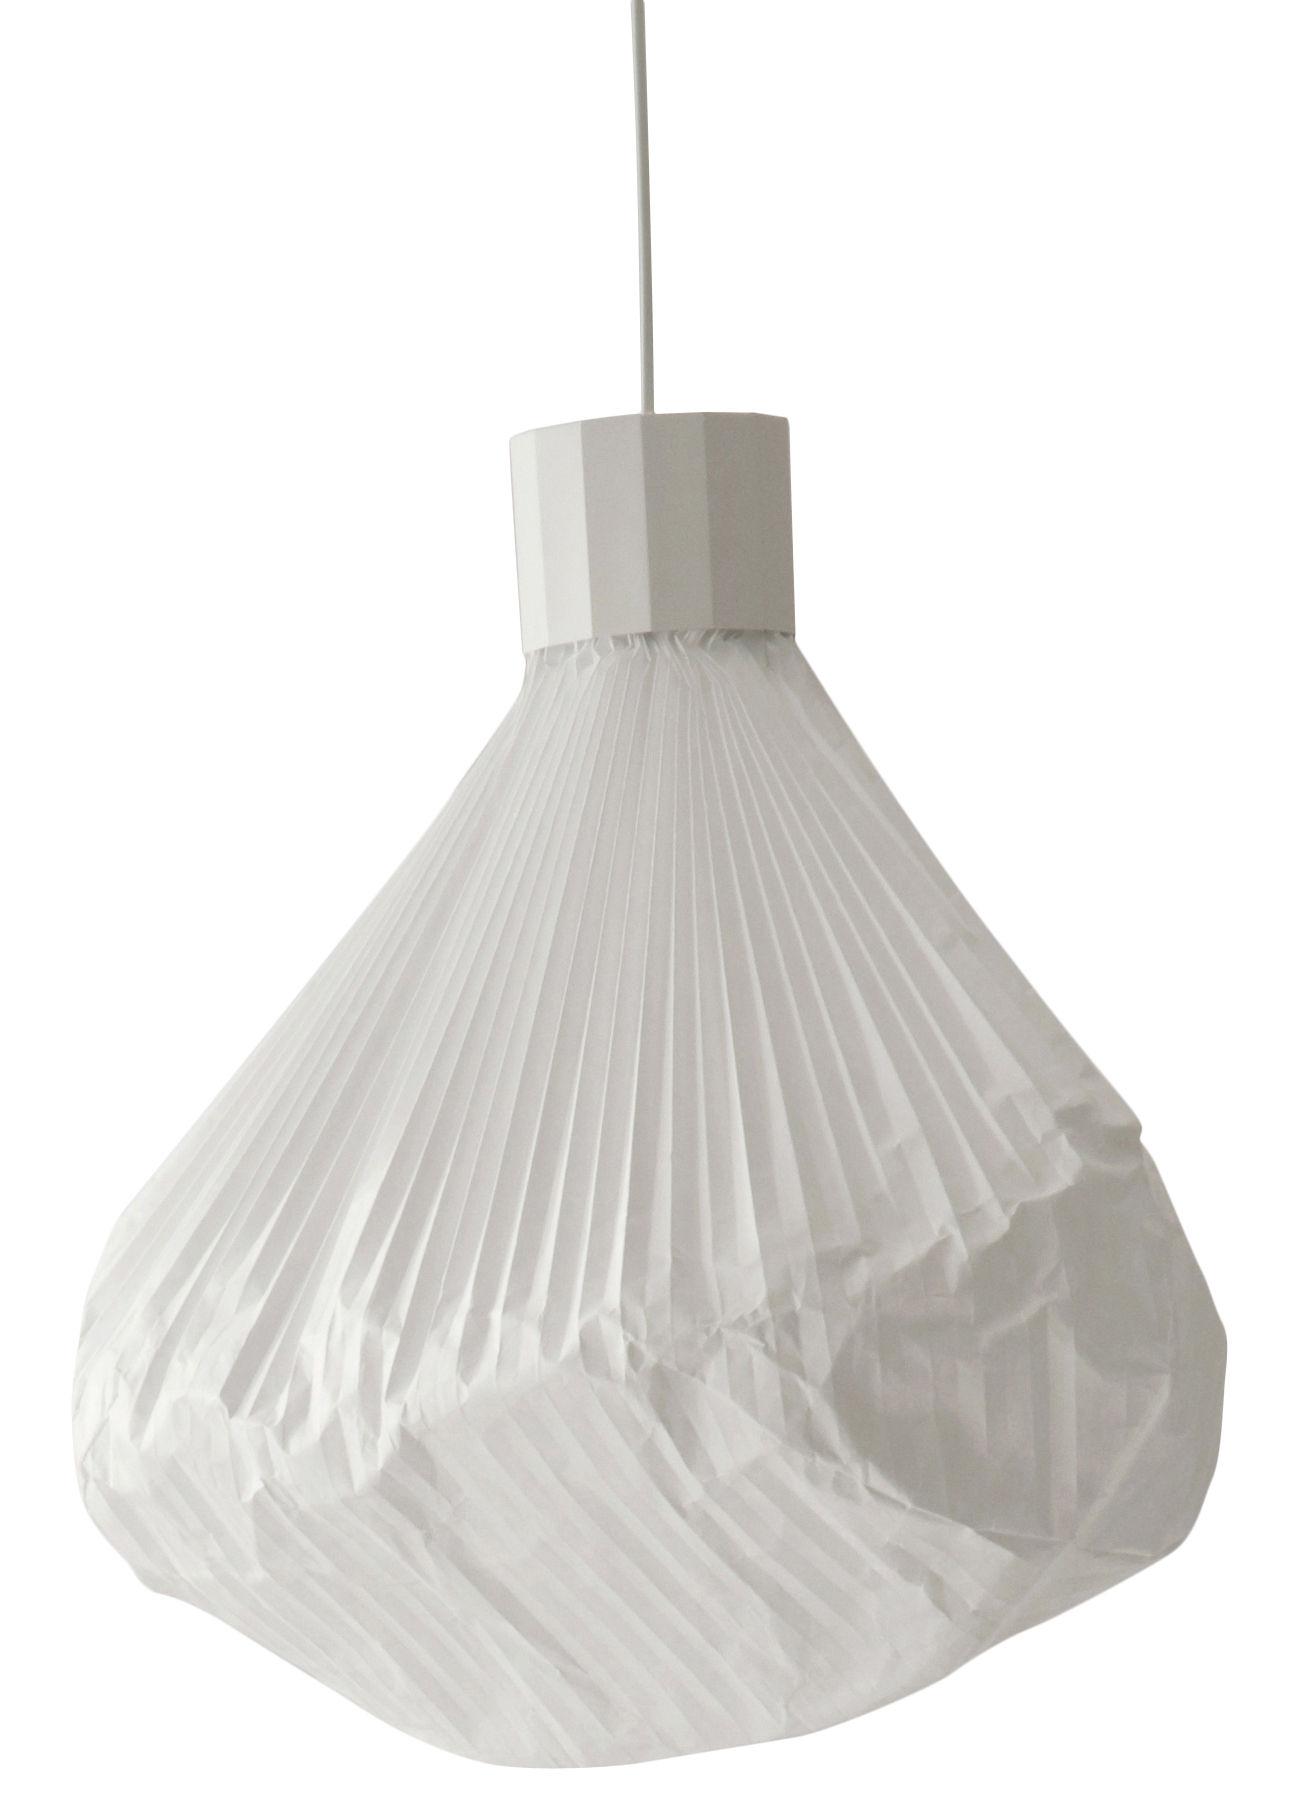 Lighting - Pendant Lighting - Vapeur Pendant by Moustache - White - Lacquered metal